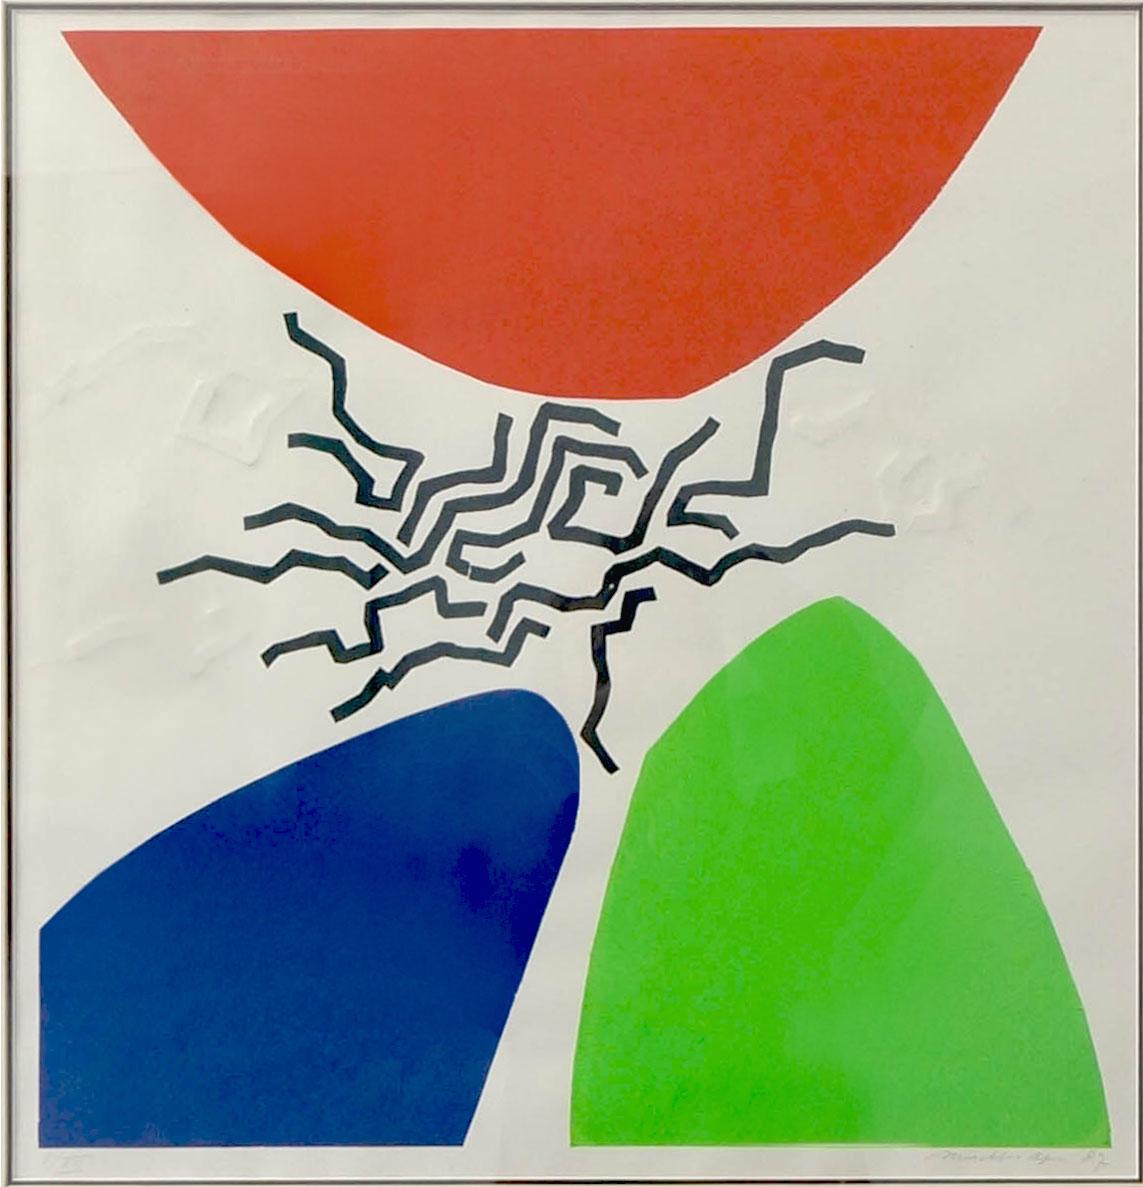 Mochtar Apin, Gunung (Mountain), lithographic print, 50 x 50 cm, 1987